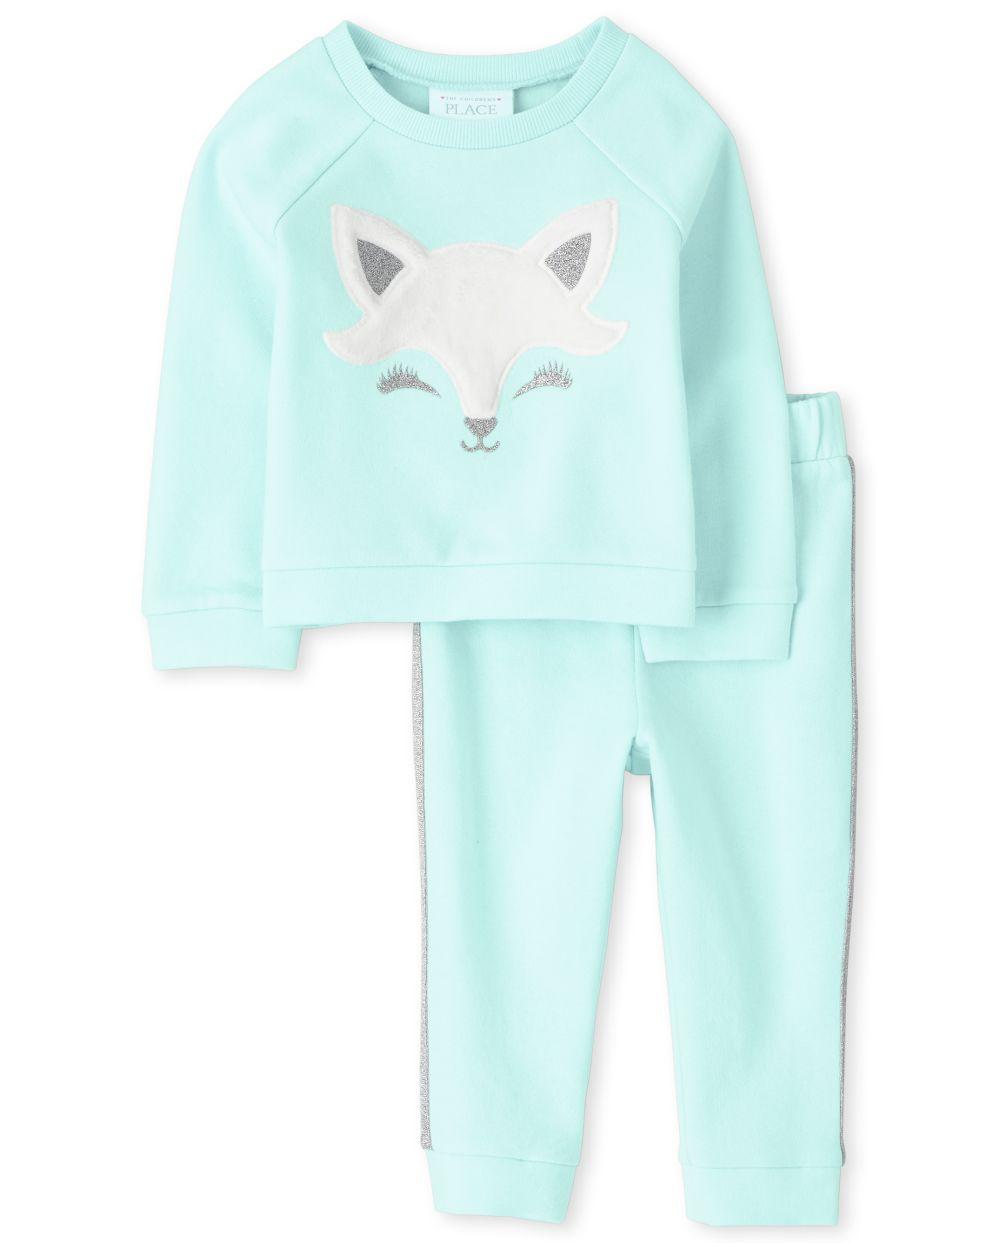 Toddler Girls Fox Outfit Set